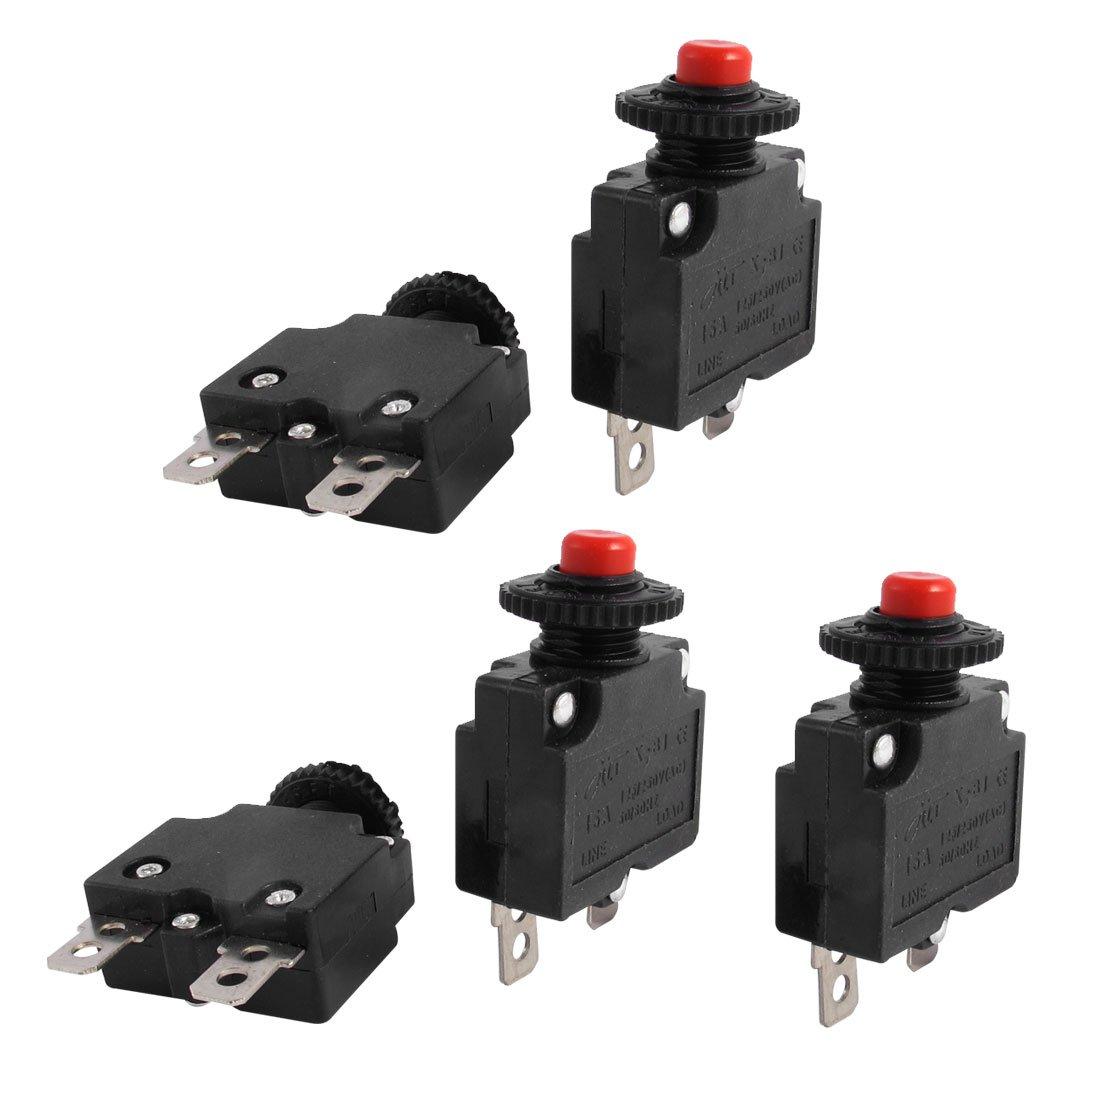 AC 125V/250V 15A Push Button Circuit Breaker for Air Compressor 5 Pcs